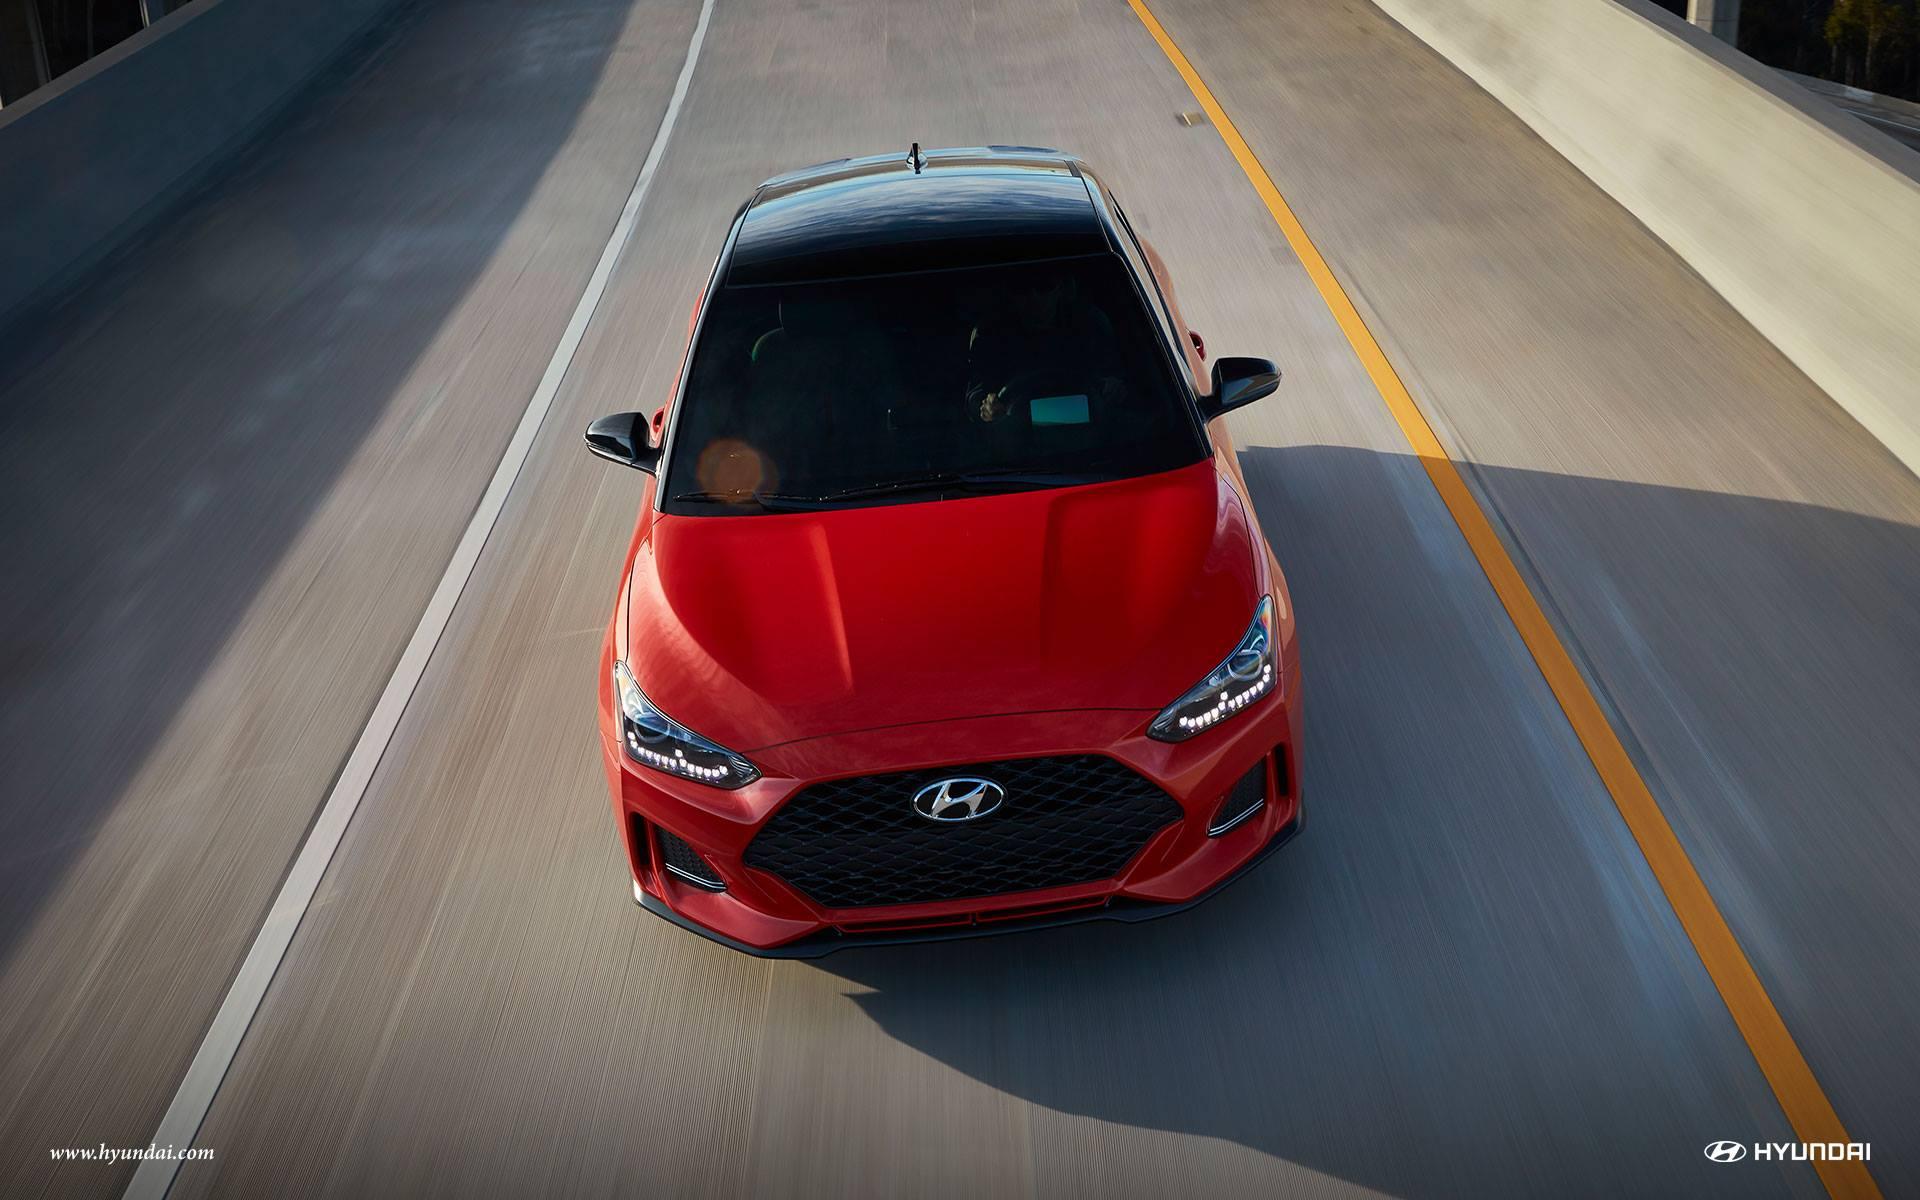 Hyundai Veloster N and turbo photos (7)